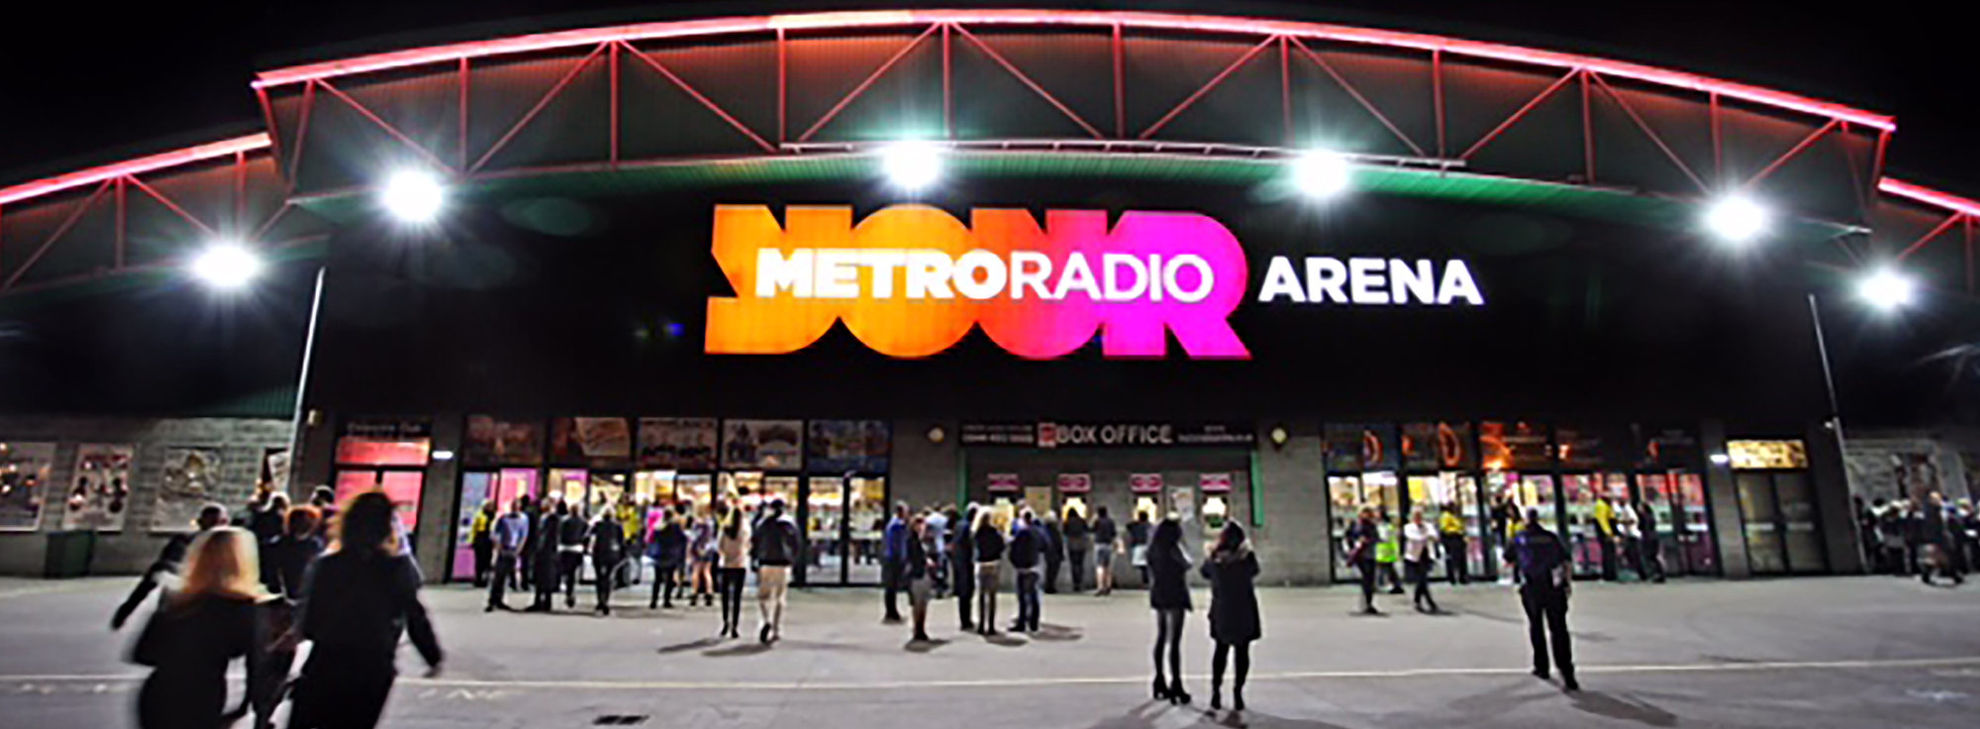 Explore Metroradio Arena